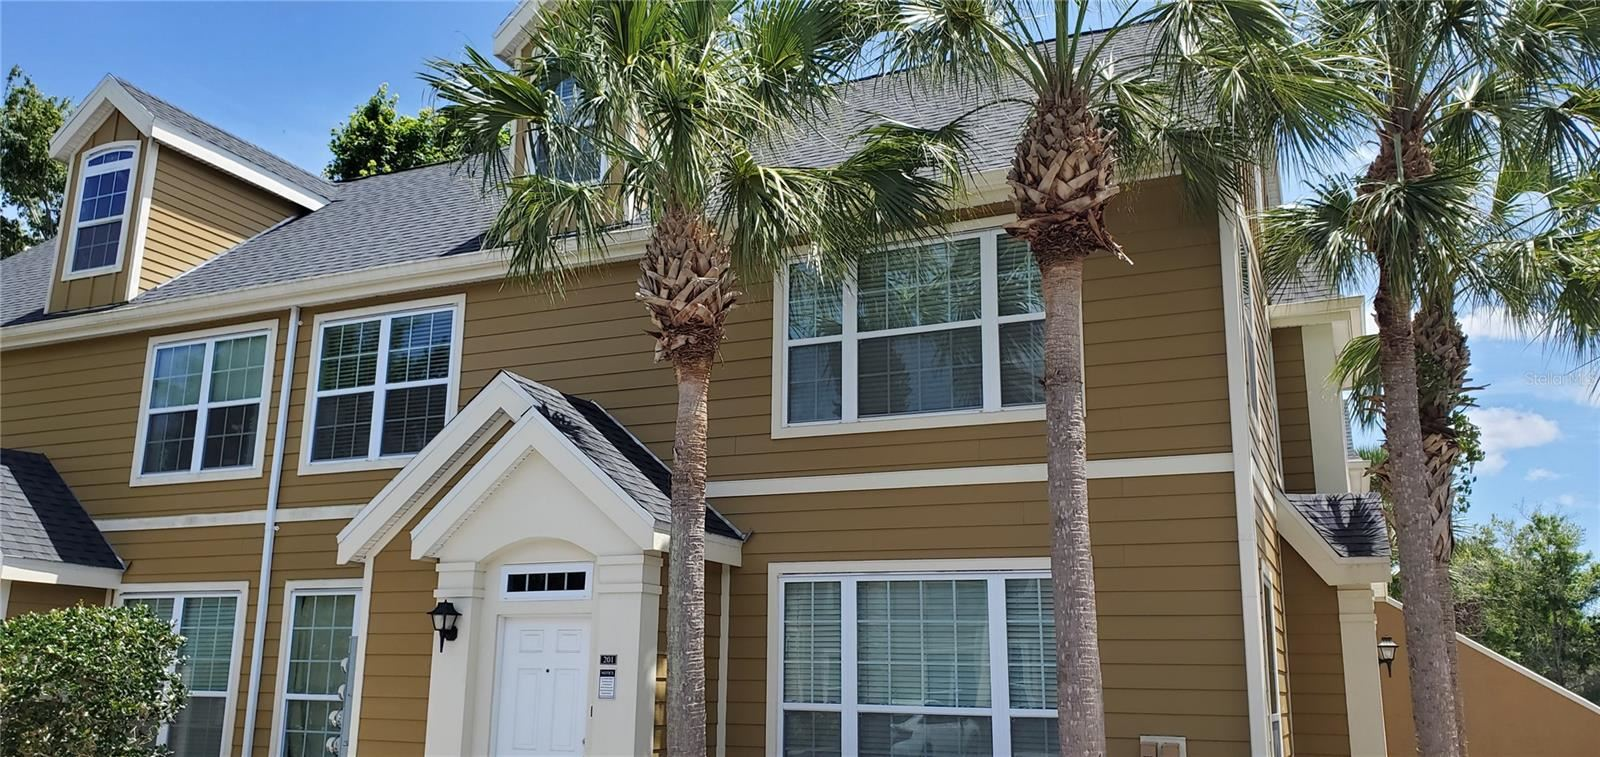 5611 BIDWELL PARKWAY #201, Sarasota, FL 34233 - #: N6115450